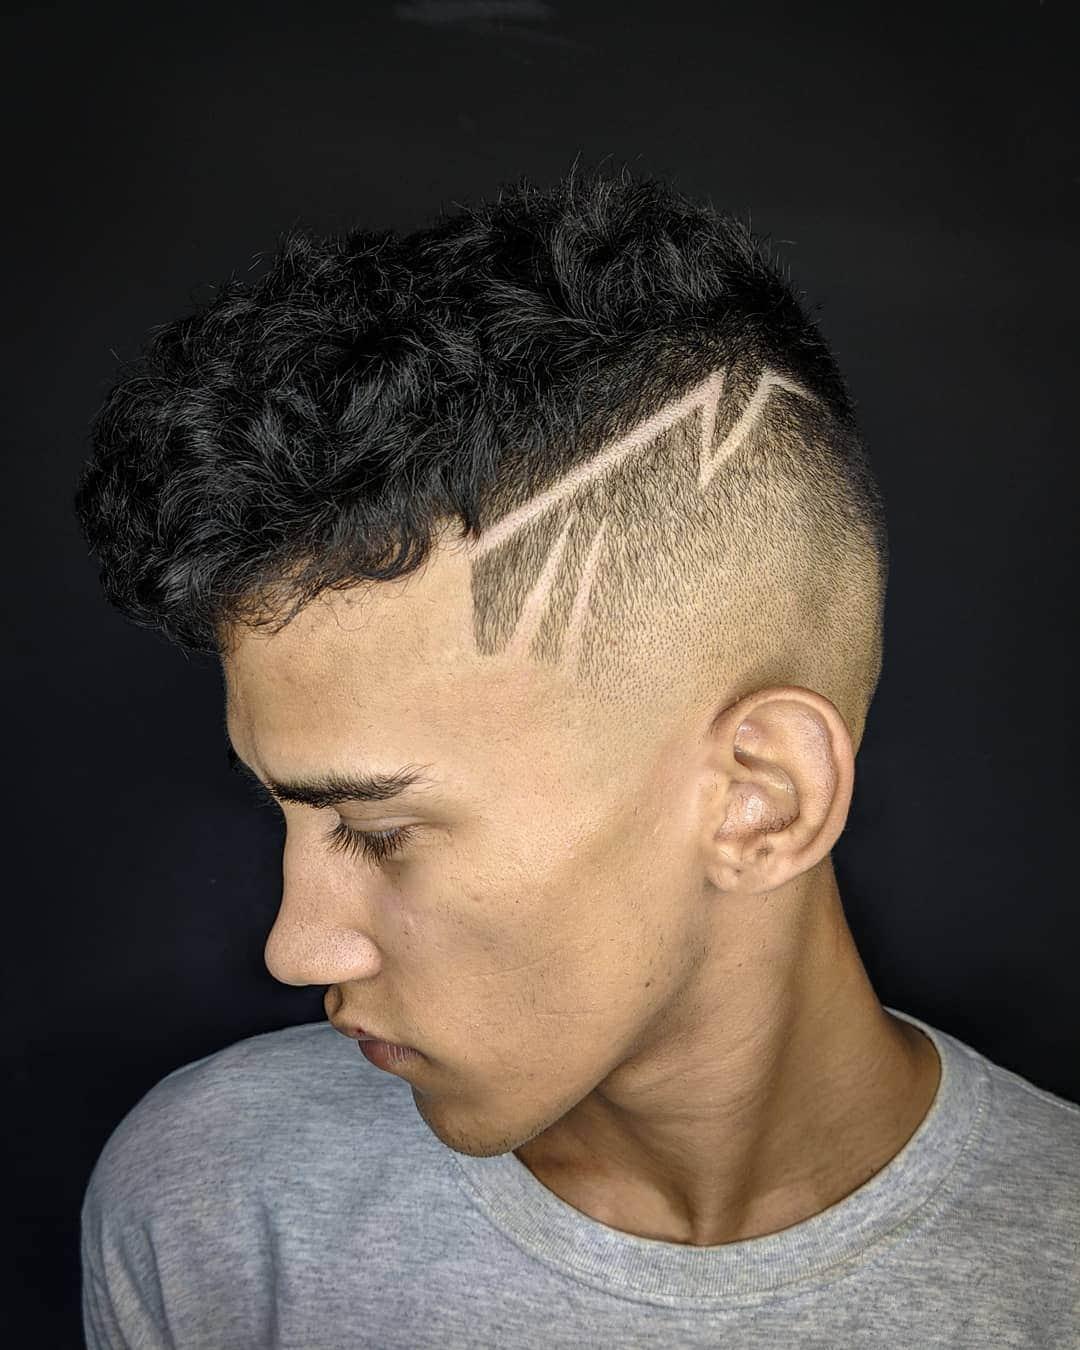 69 Best Undercut Hairstyles For Men You Can Try In 2020 Peaky Blinders